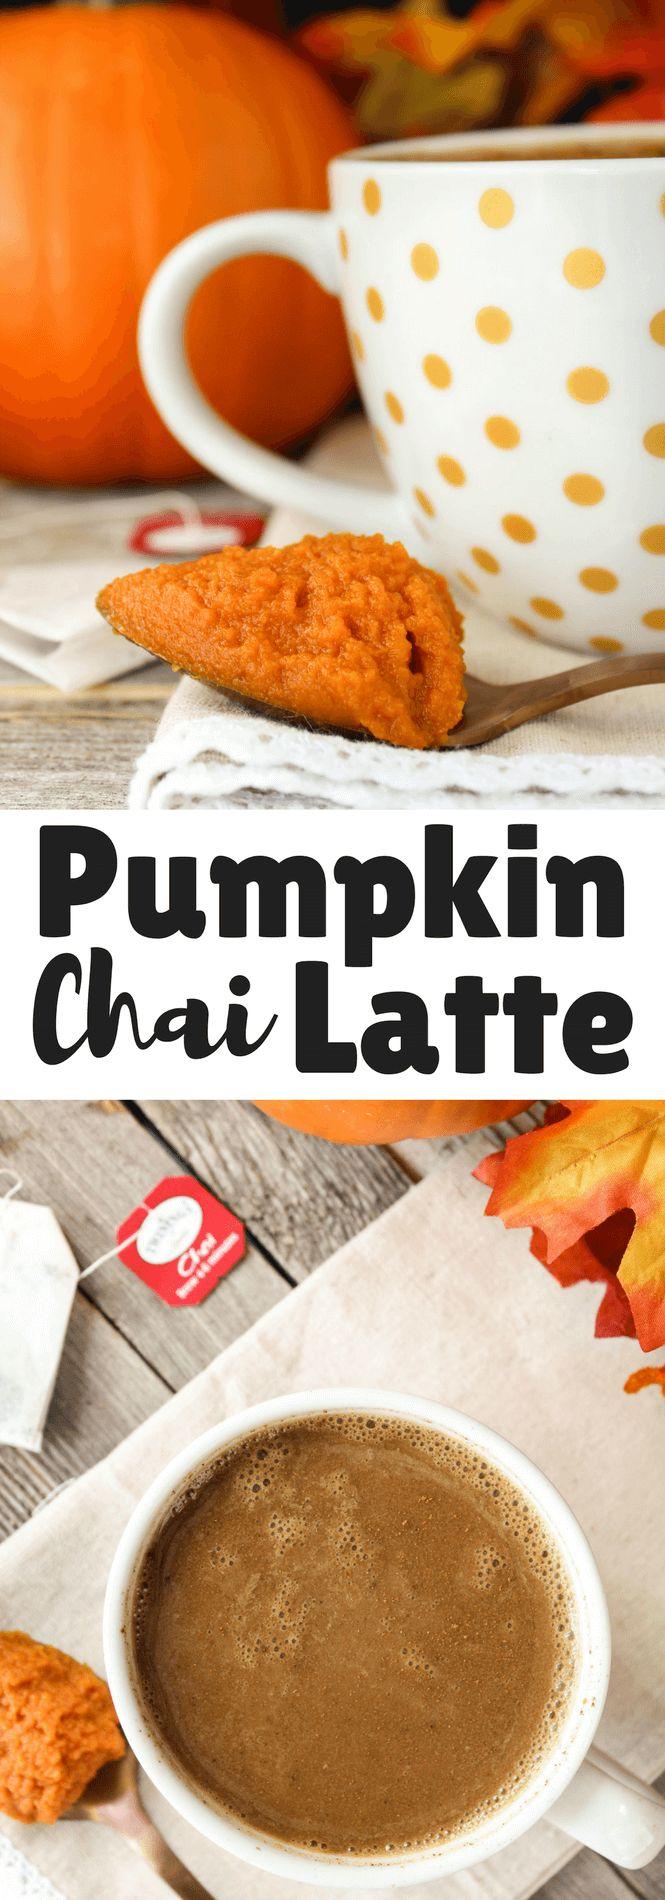 Pumpkin Chai Latte #pumpkin #fallrecipe